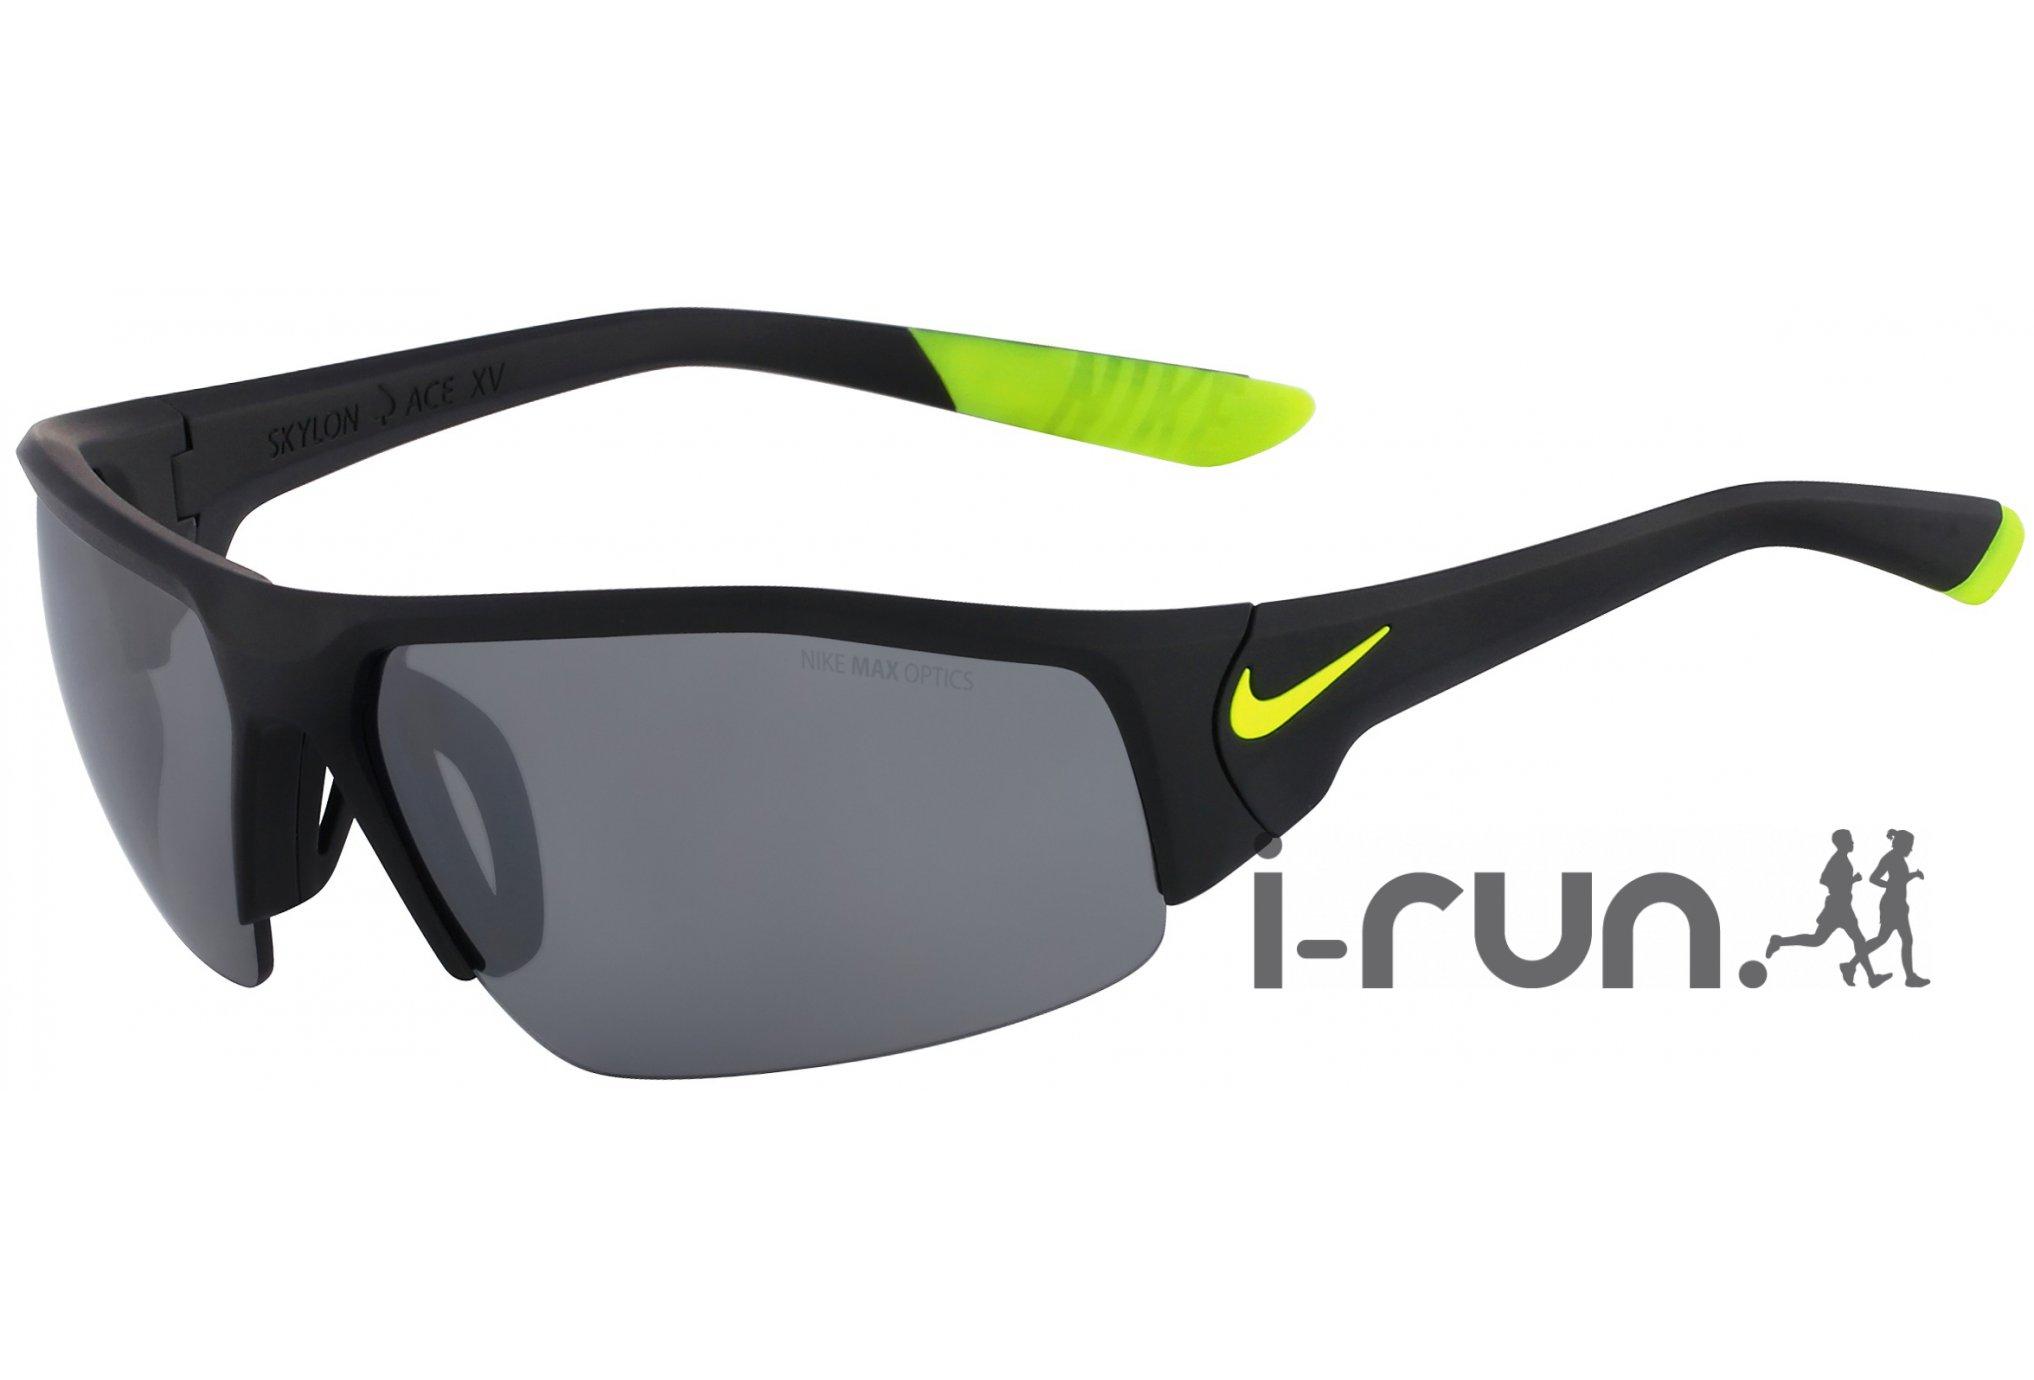 6fa184e285 Test- Lunettes de soleil Nike Skylon Ace XV – U Run